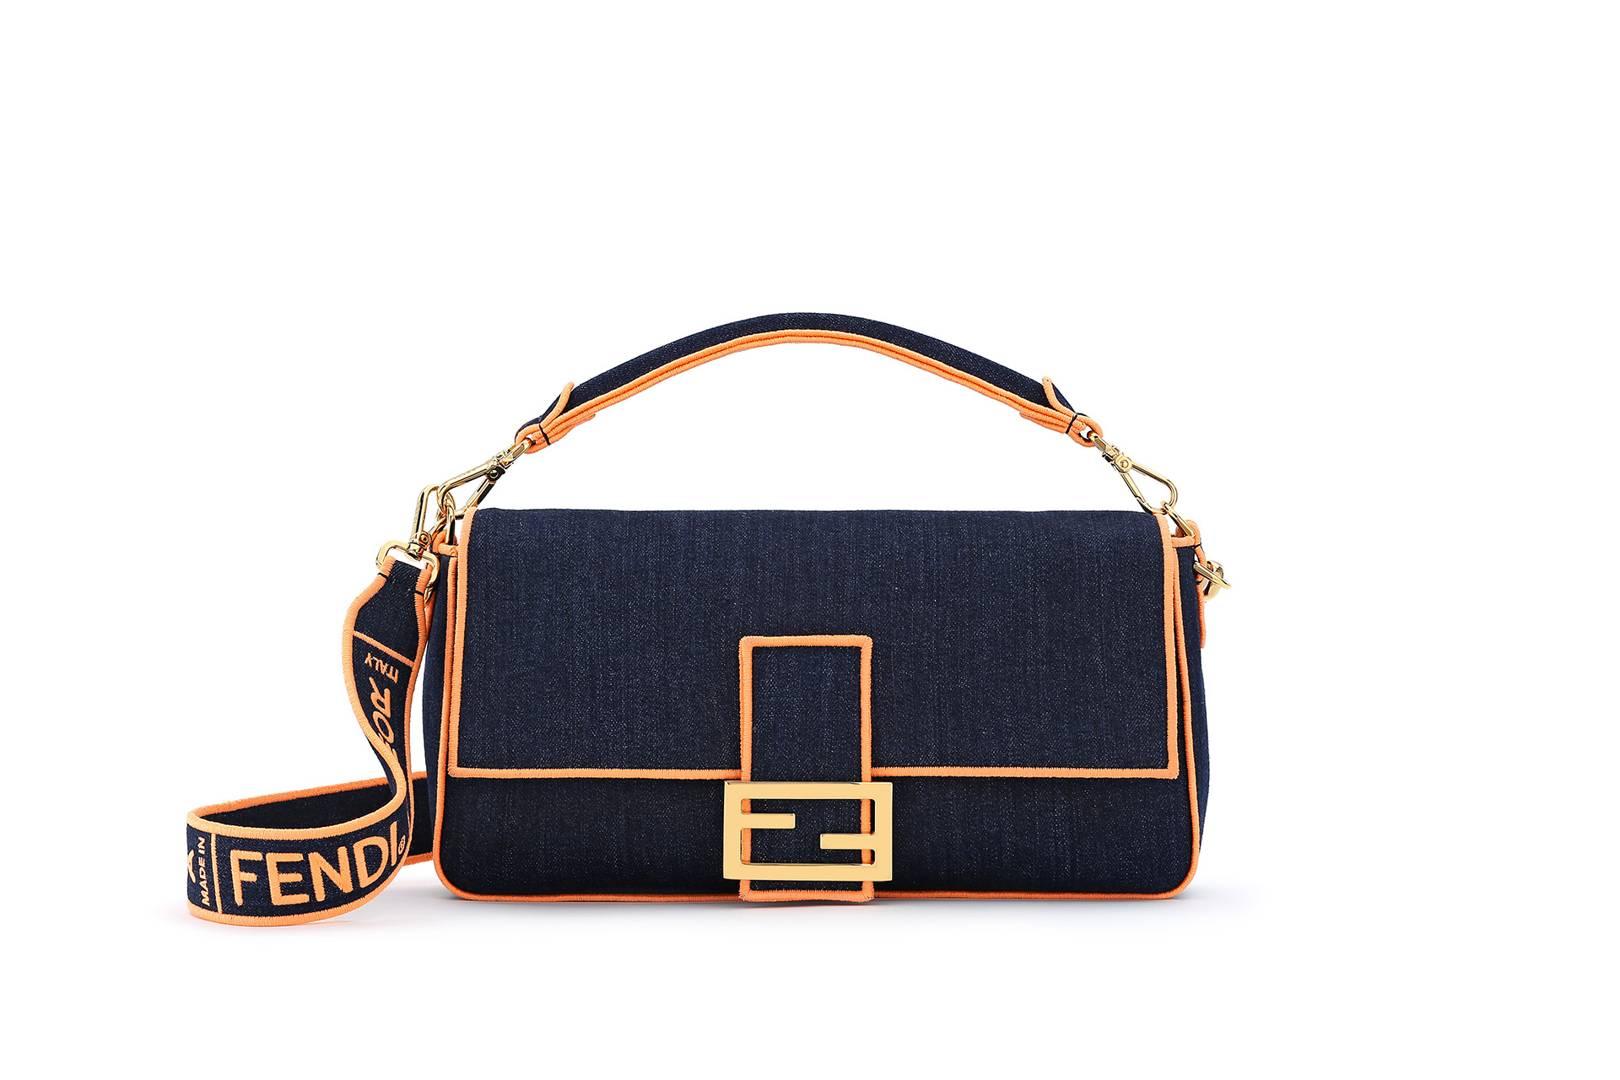 e6f5f112eaab Everyone Is Carrying The Fendi Baguette Bag